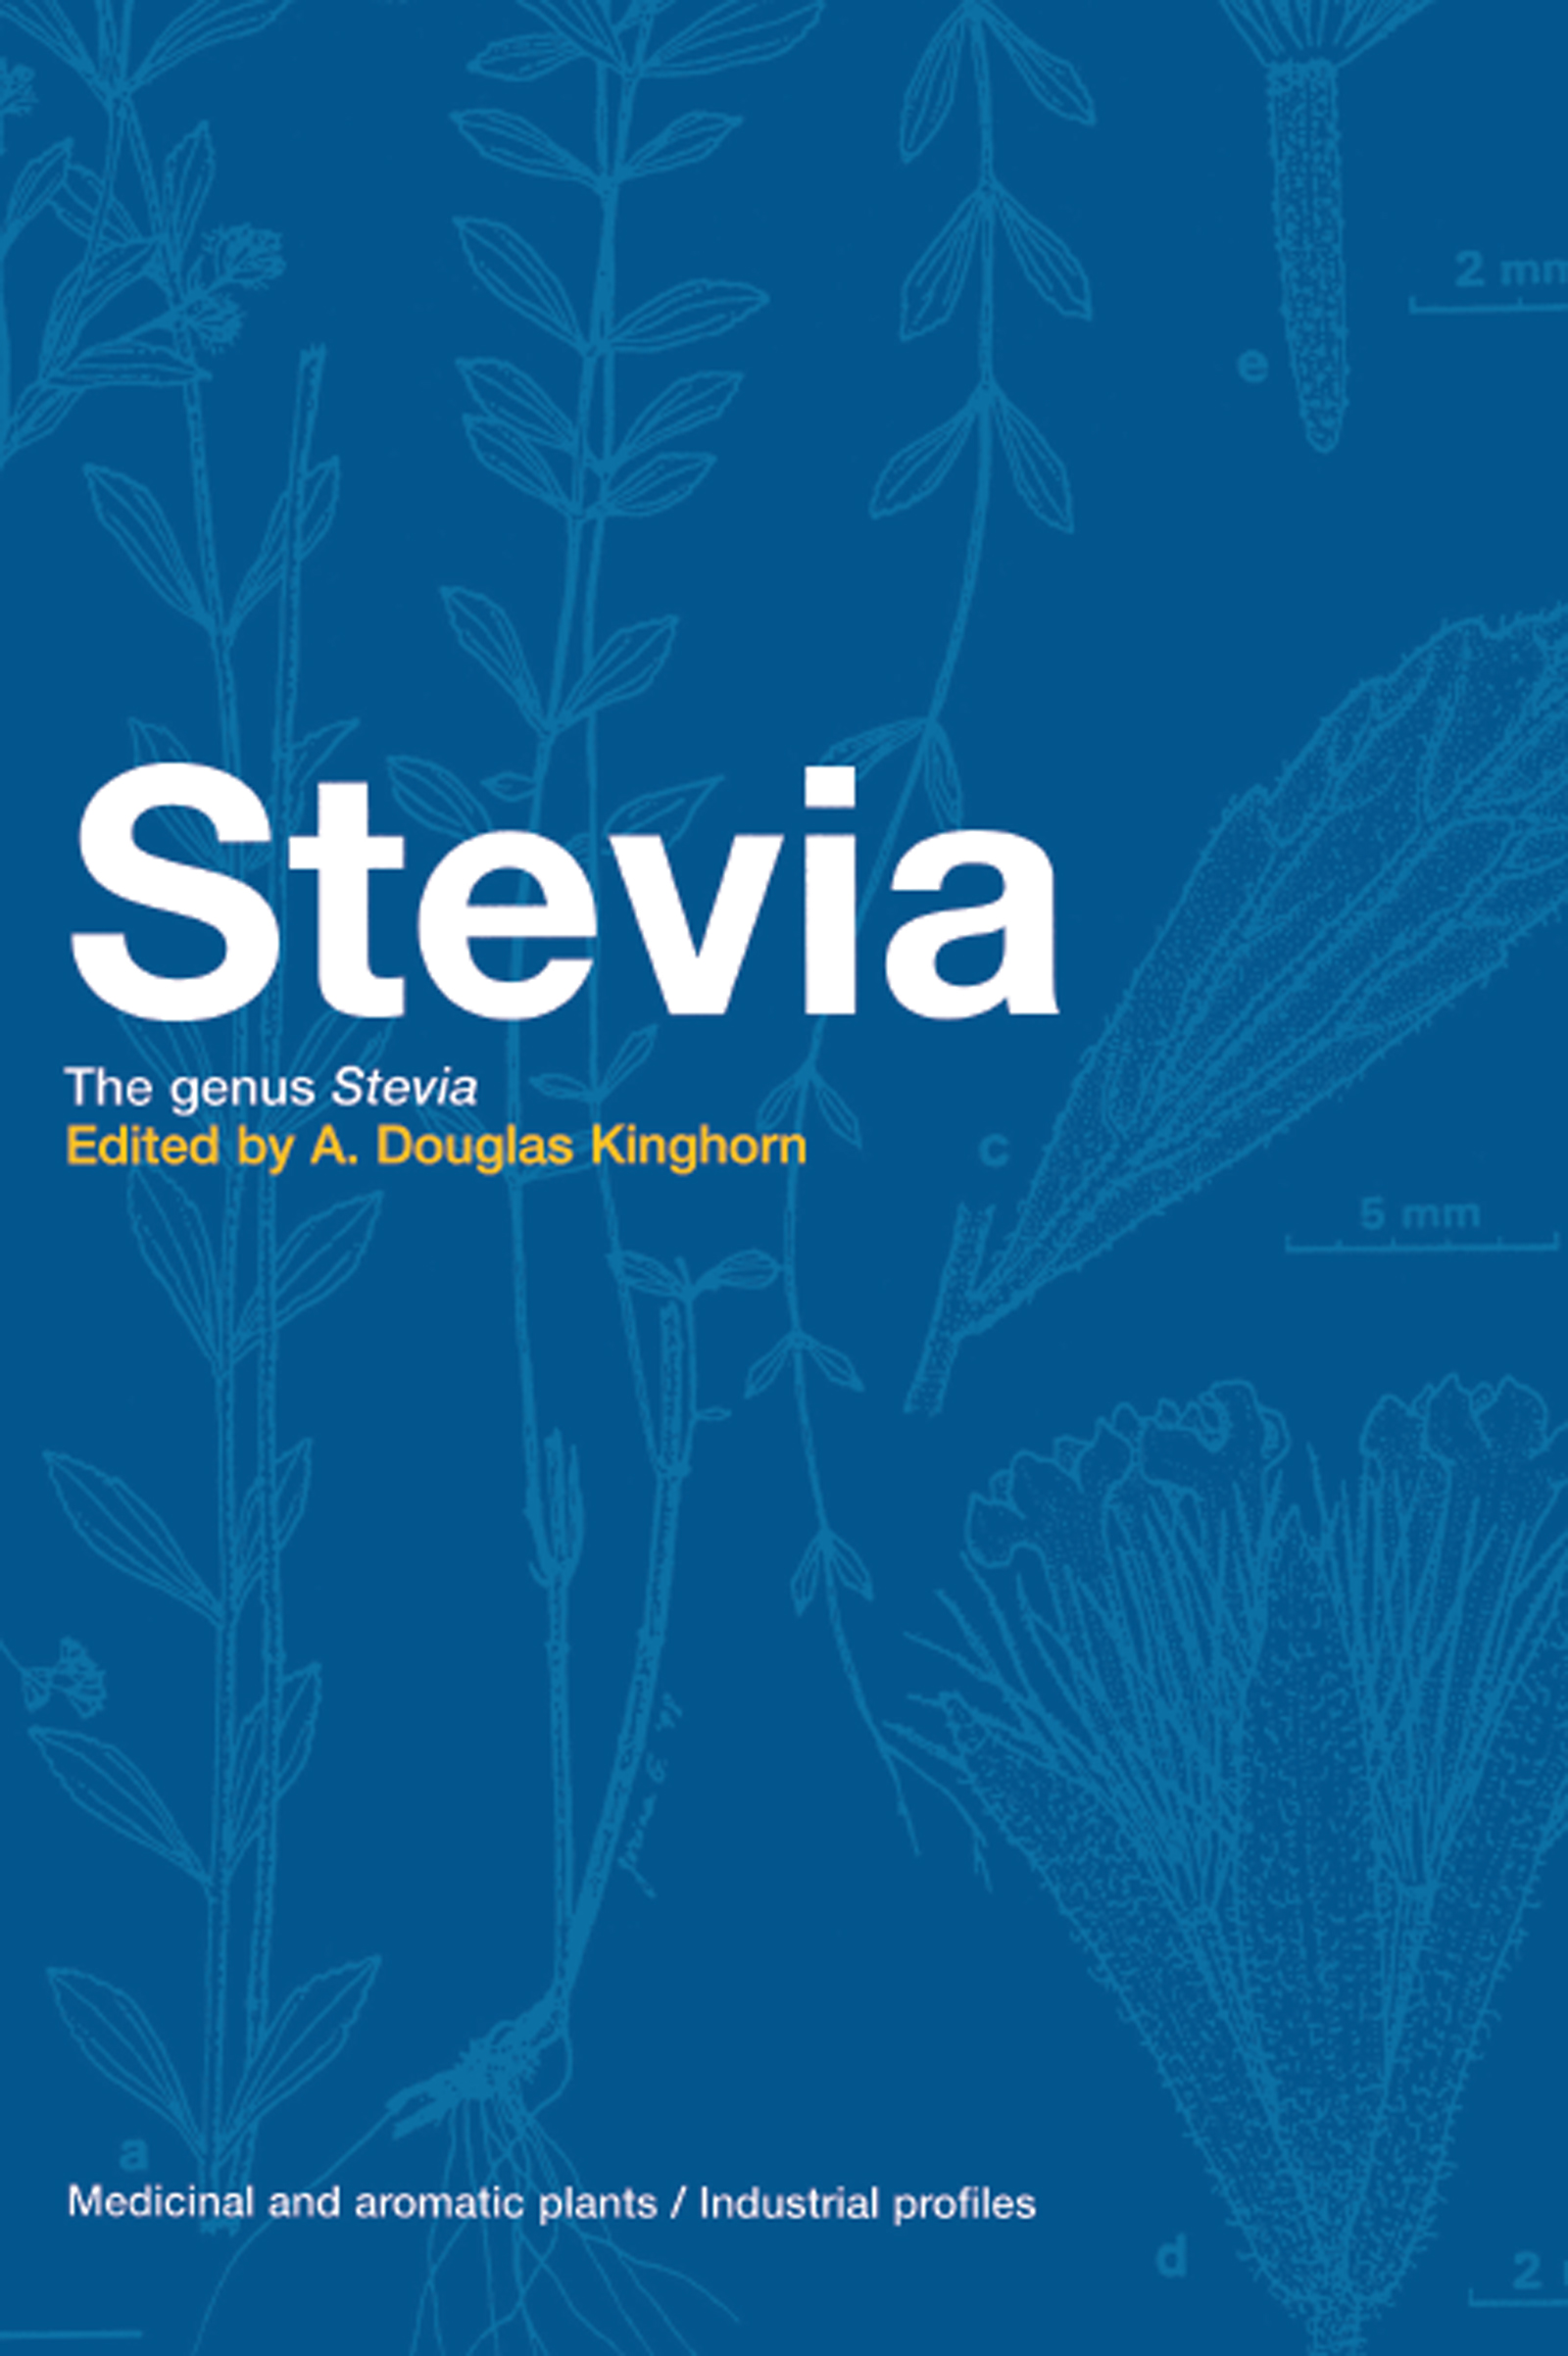 Stevia: The Genus Stevia book cover